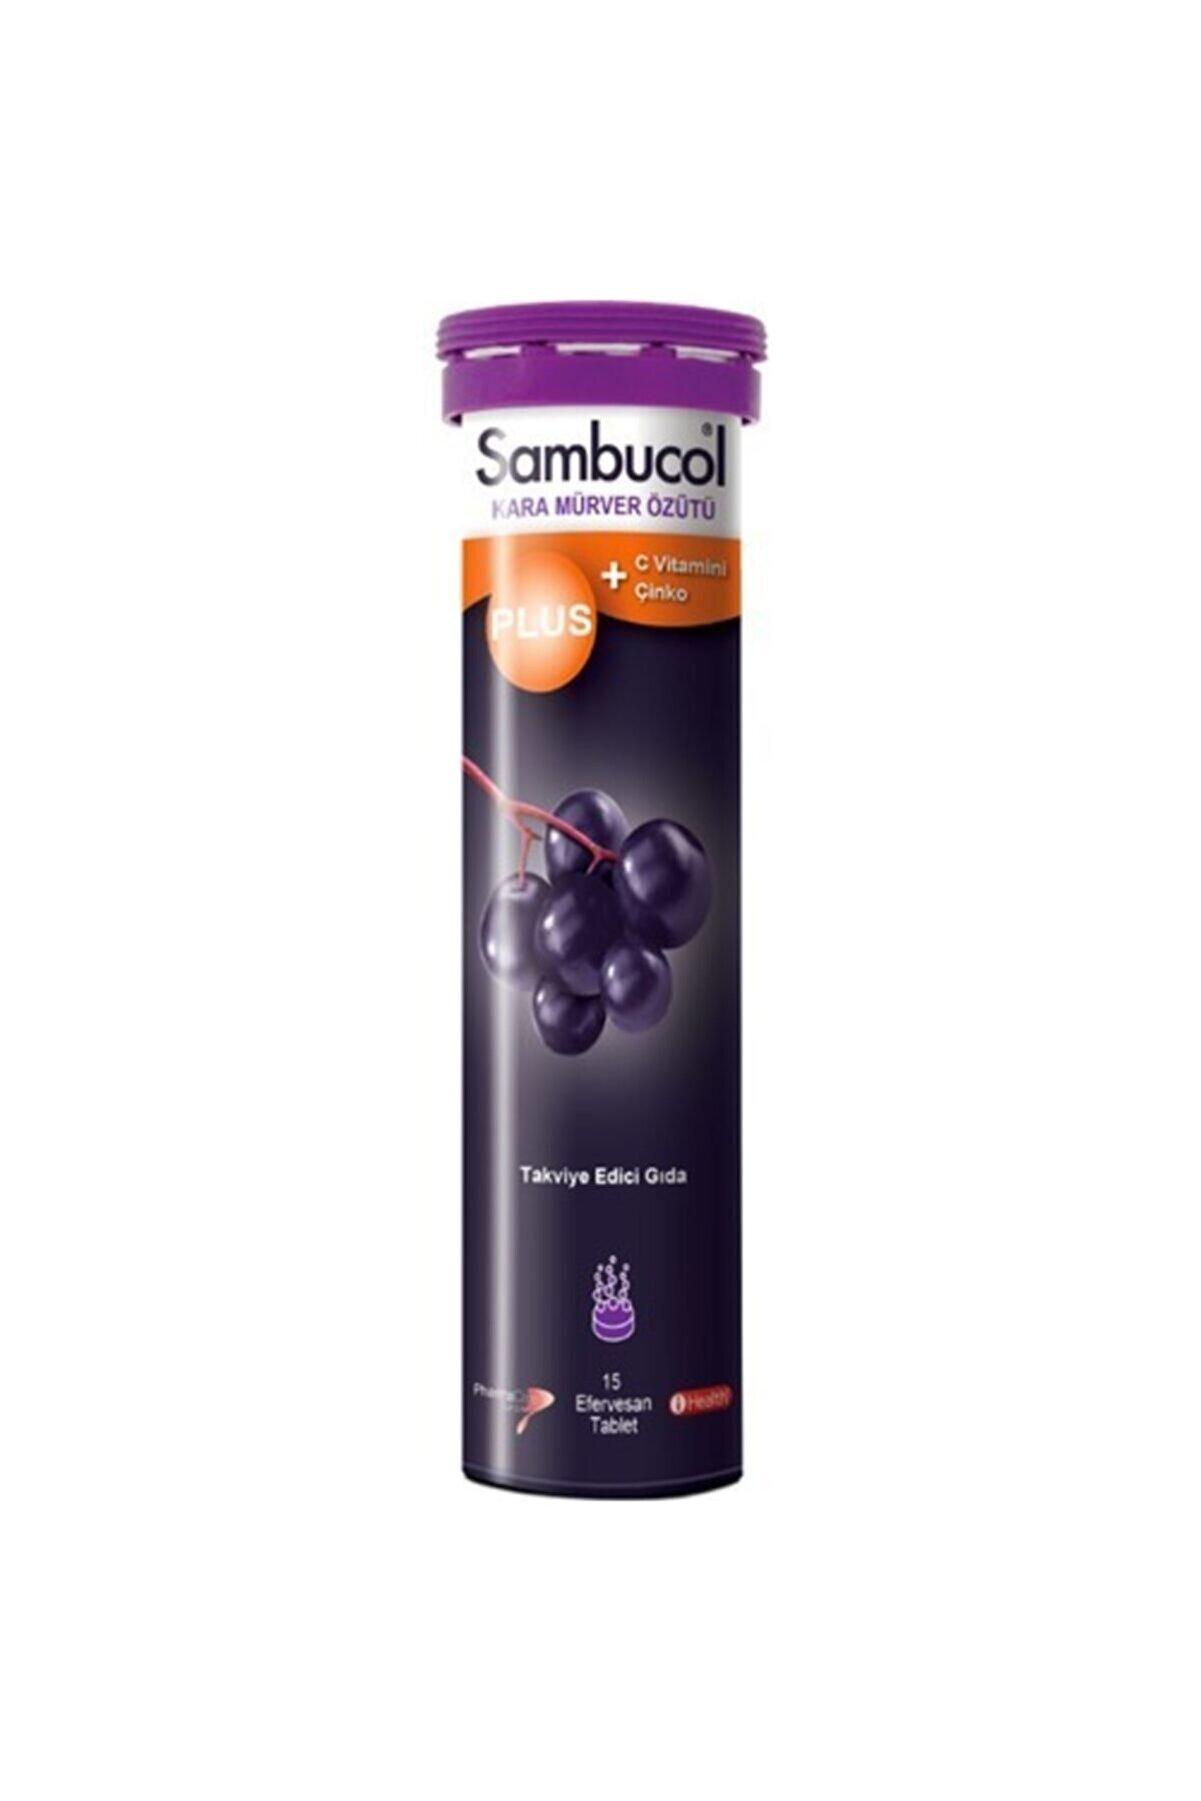 Sambucol Plus Kara Mürver + C Vitamini Çinko Takviye Edici Gıda 15 Tablet (skt:08.2022)